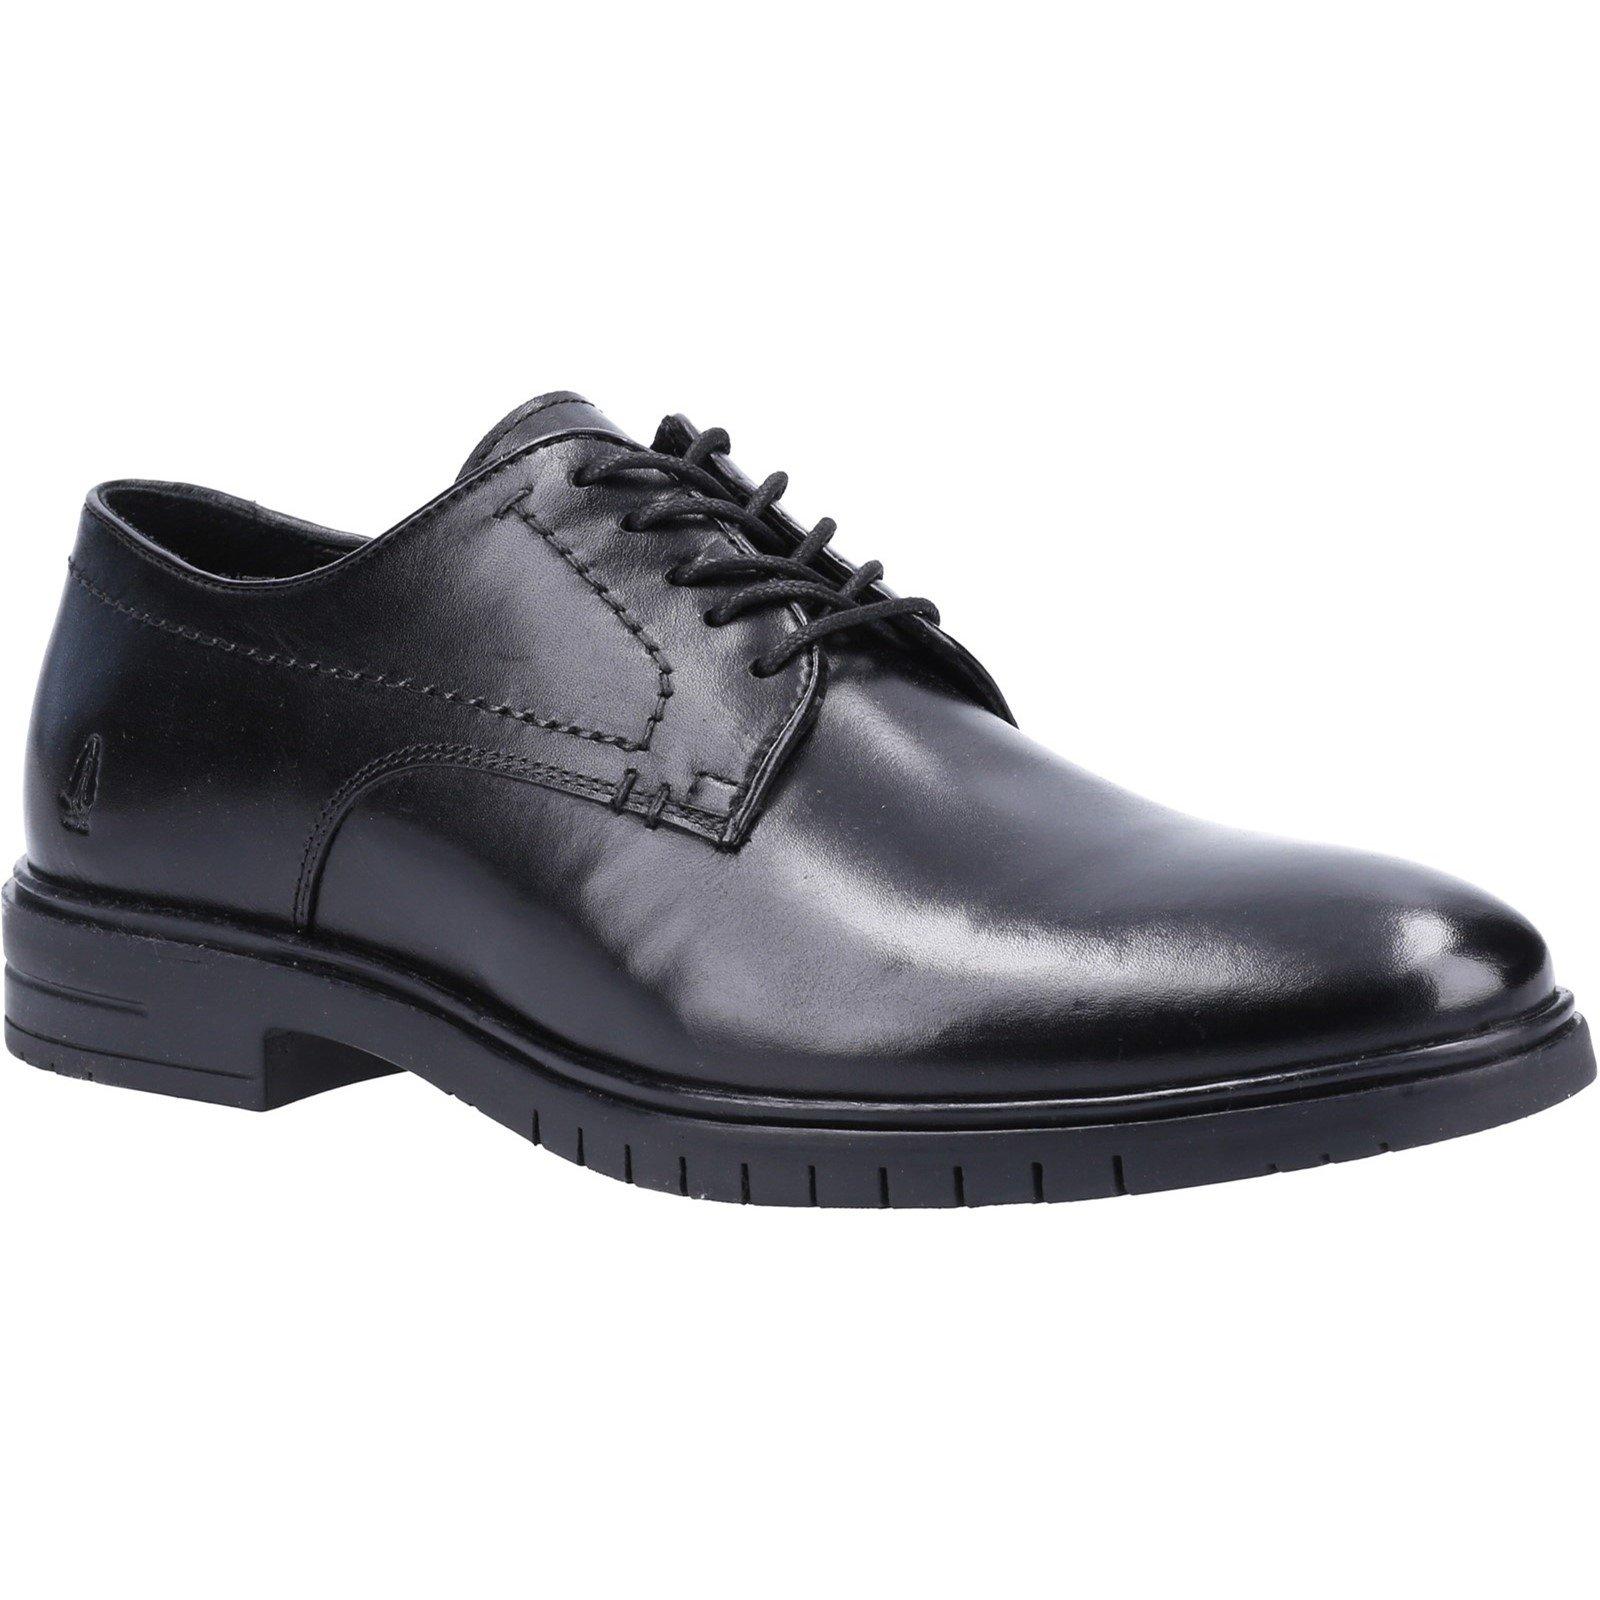 Hush Puppies Men's Sterling Lace Derby Shoe Black 31992 - Black 9